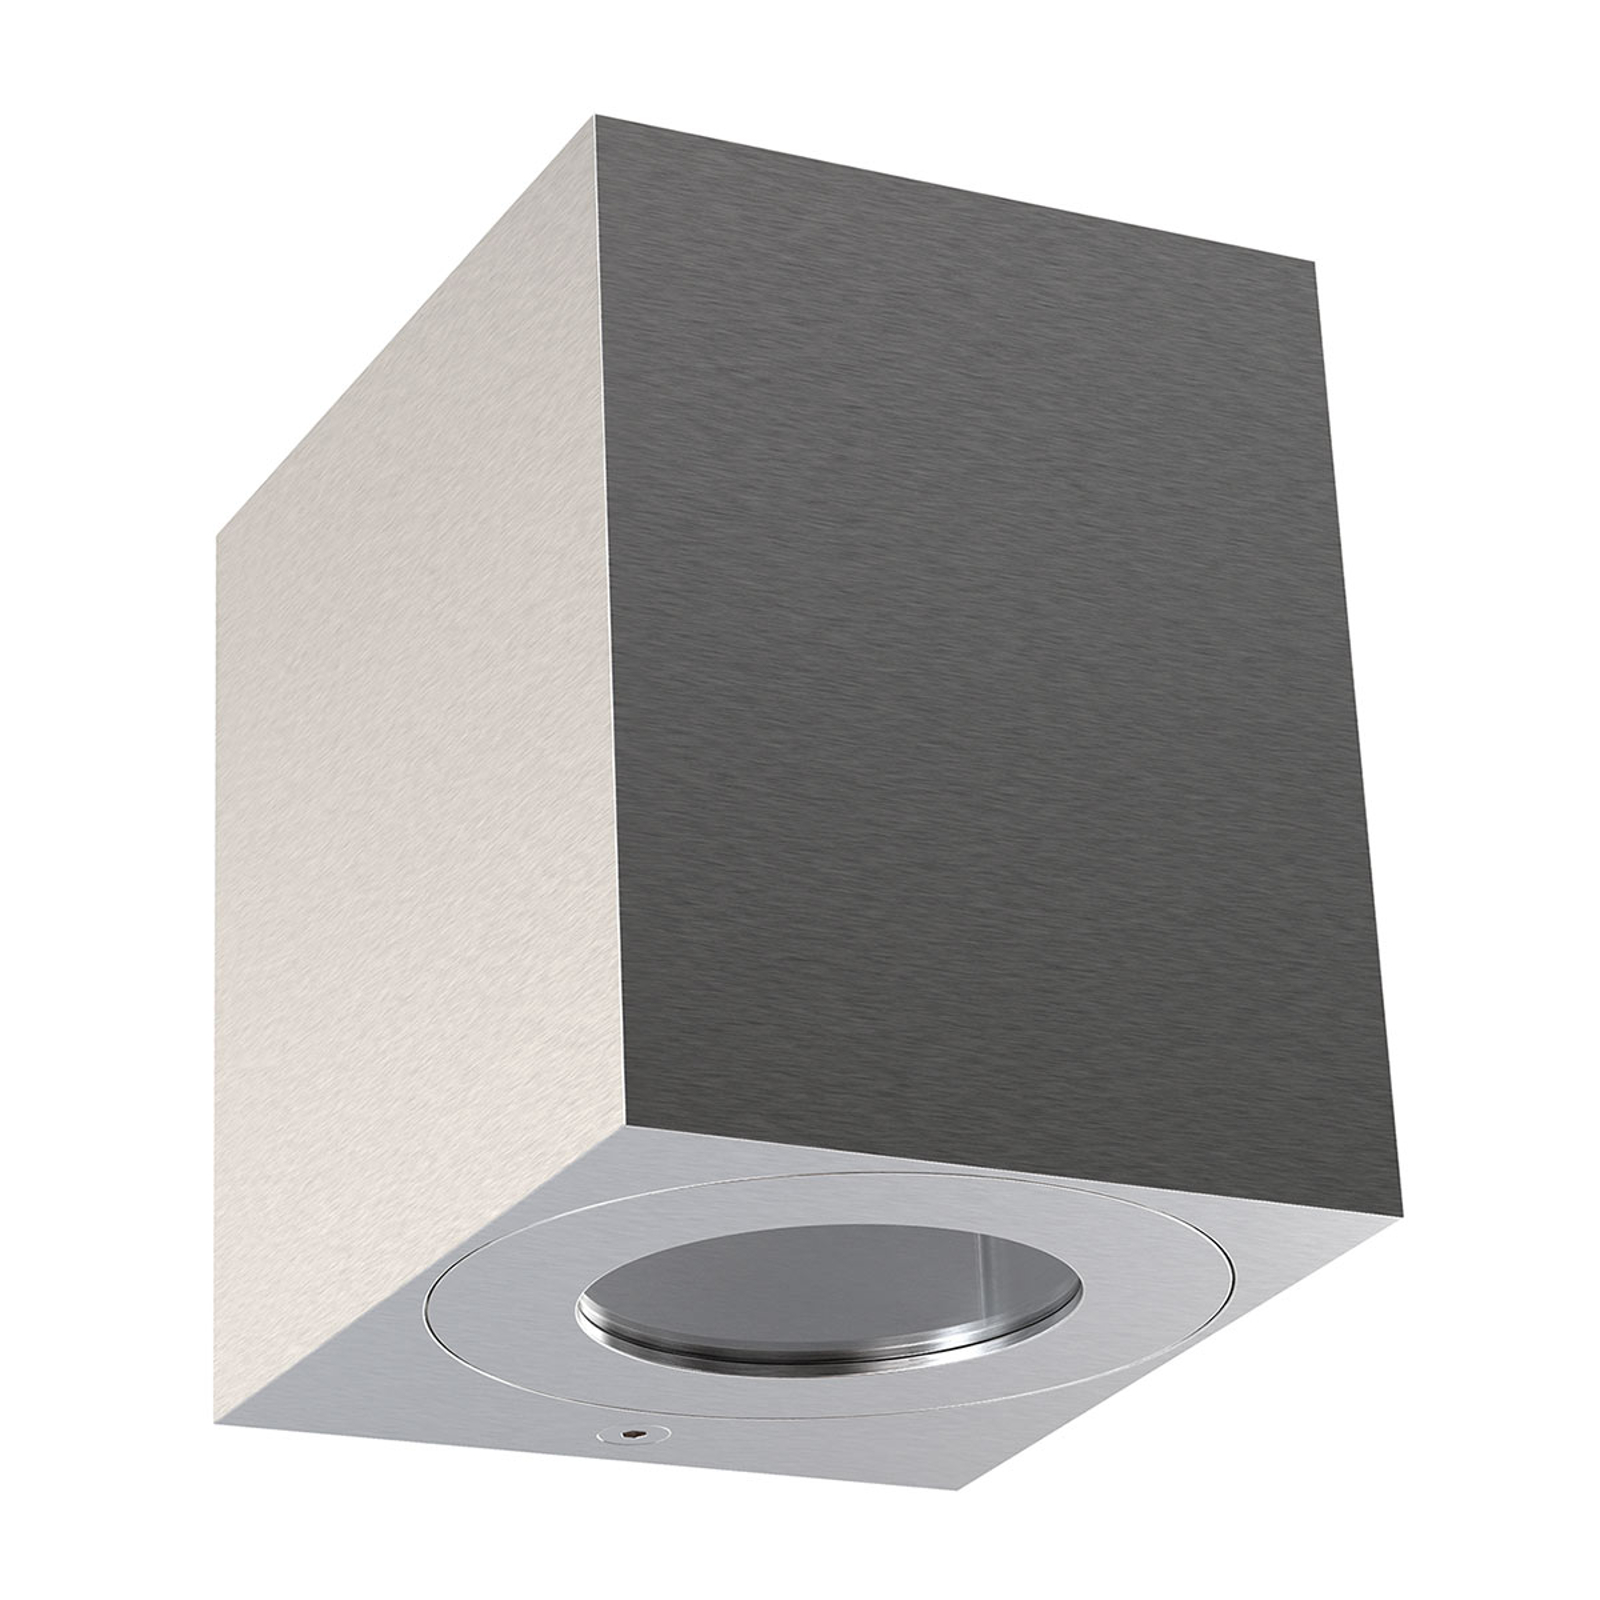 LED buitenwandlamp Canto Kubi 2, 10cm RVS